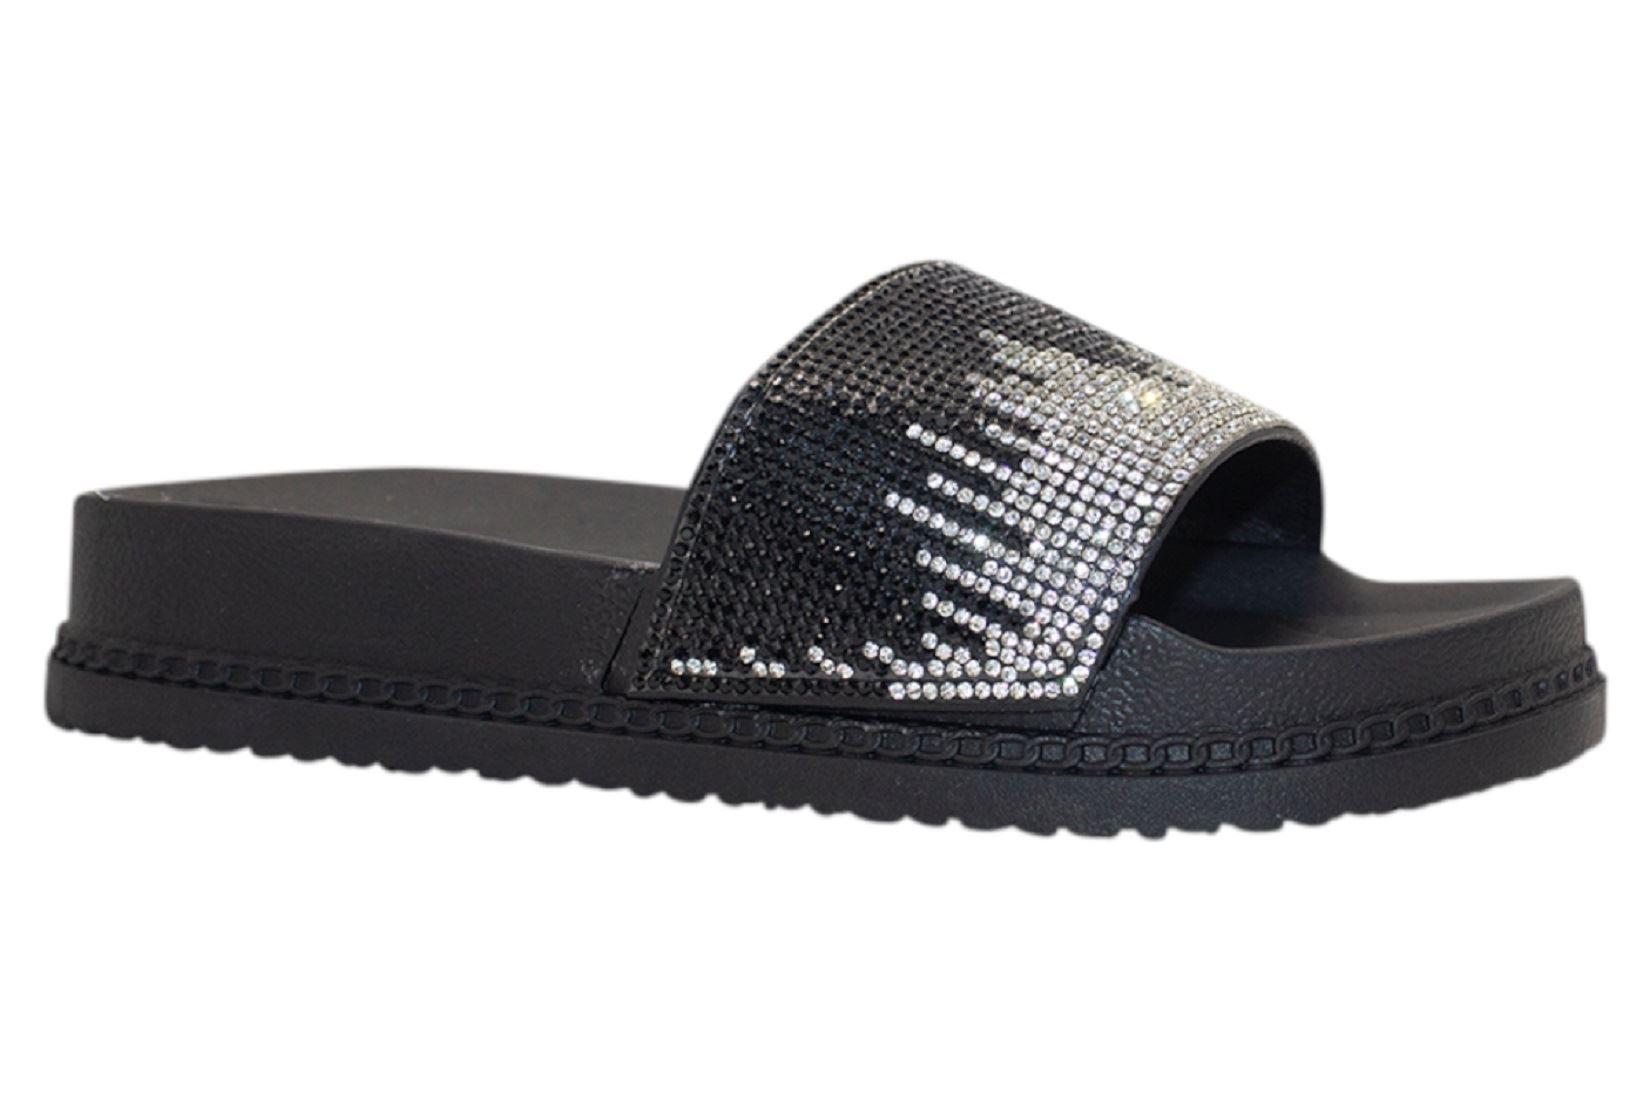 Womens-Sliders-Casual-Slippers-Mules-Ladies-Diamante-Flip-Flop-Sandals-Shoes thumbnail 42